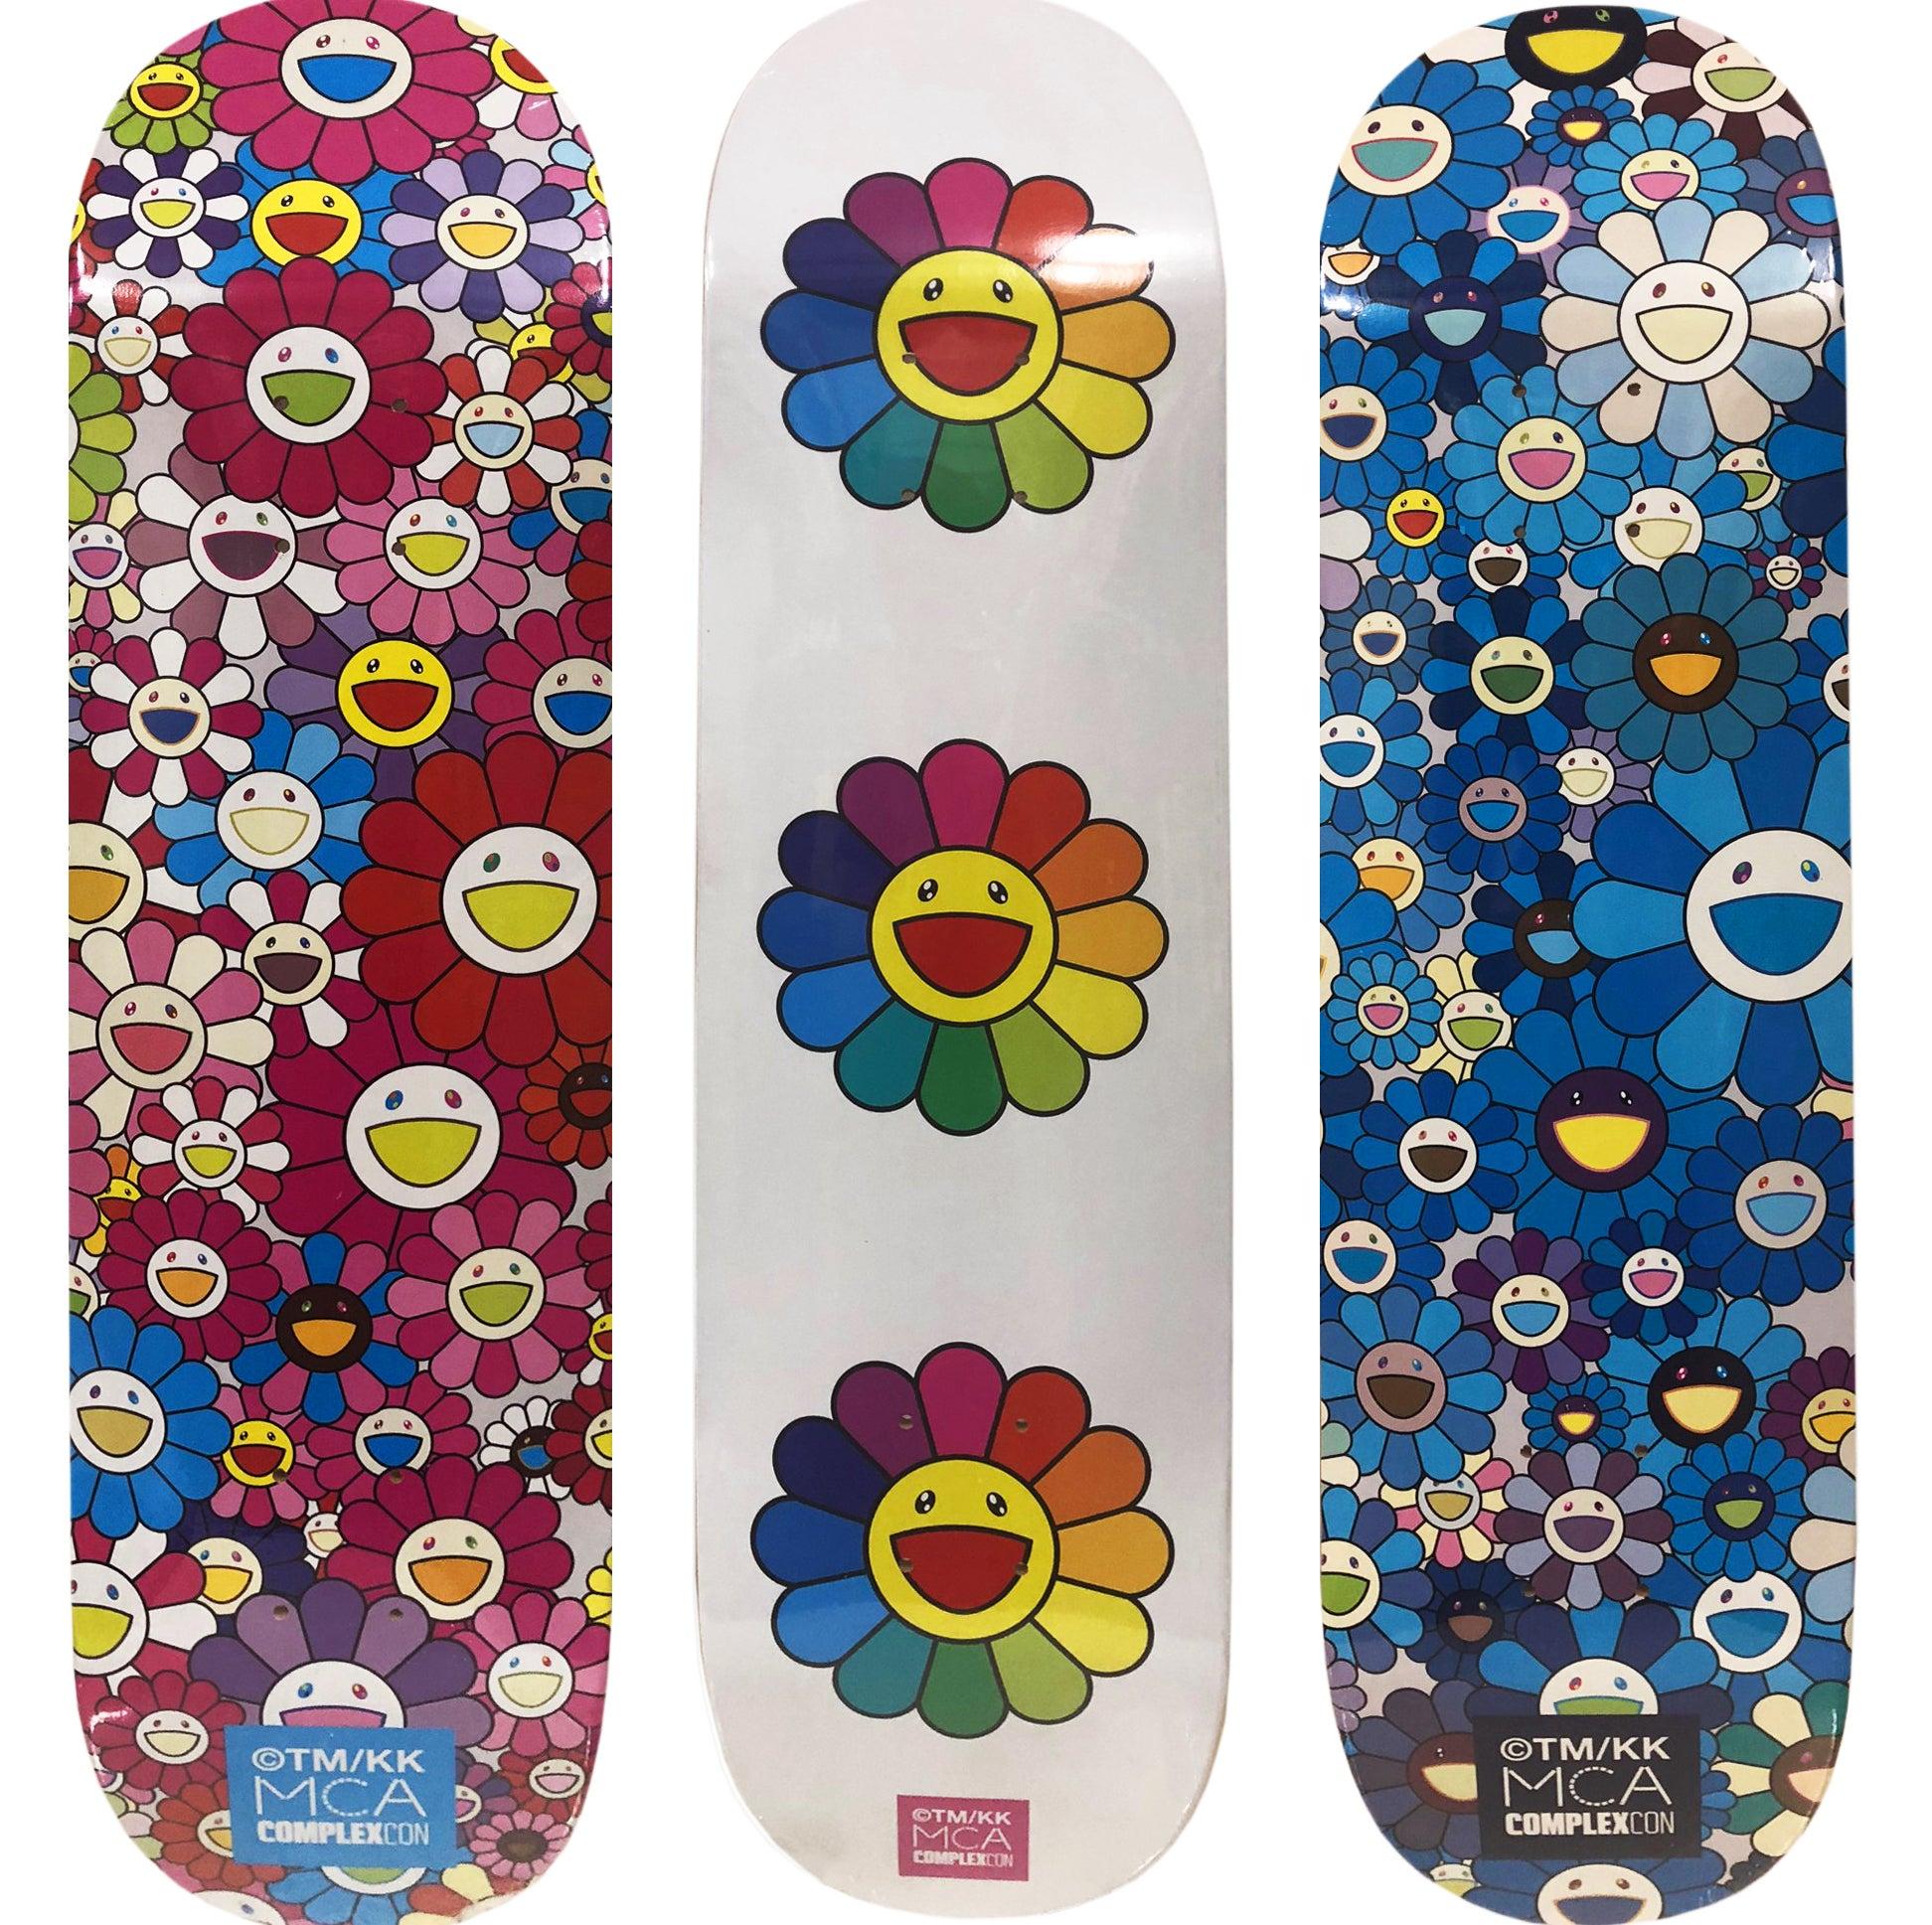 af557fa8 Takashi Murakami - Takashi Murakami Flowers Skateboard Decks (set of ...